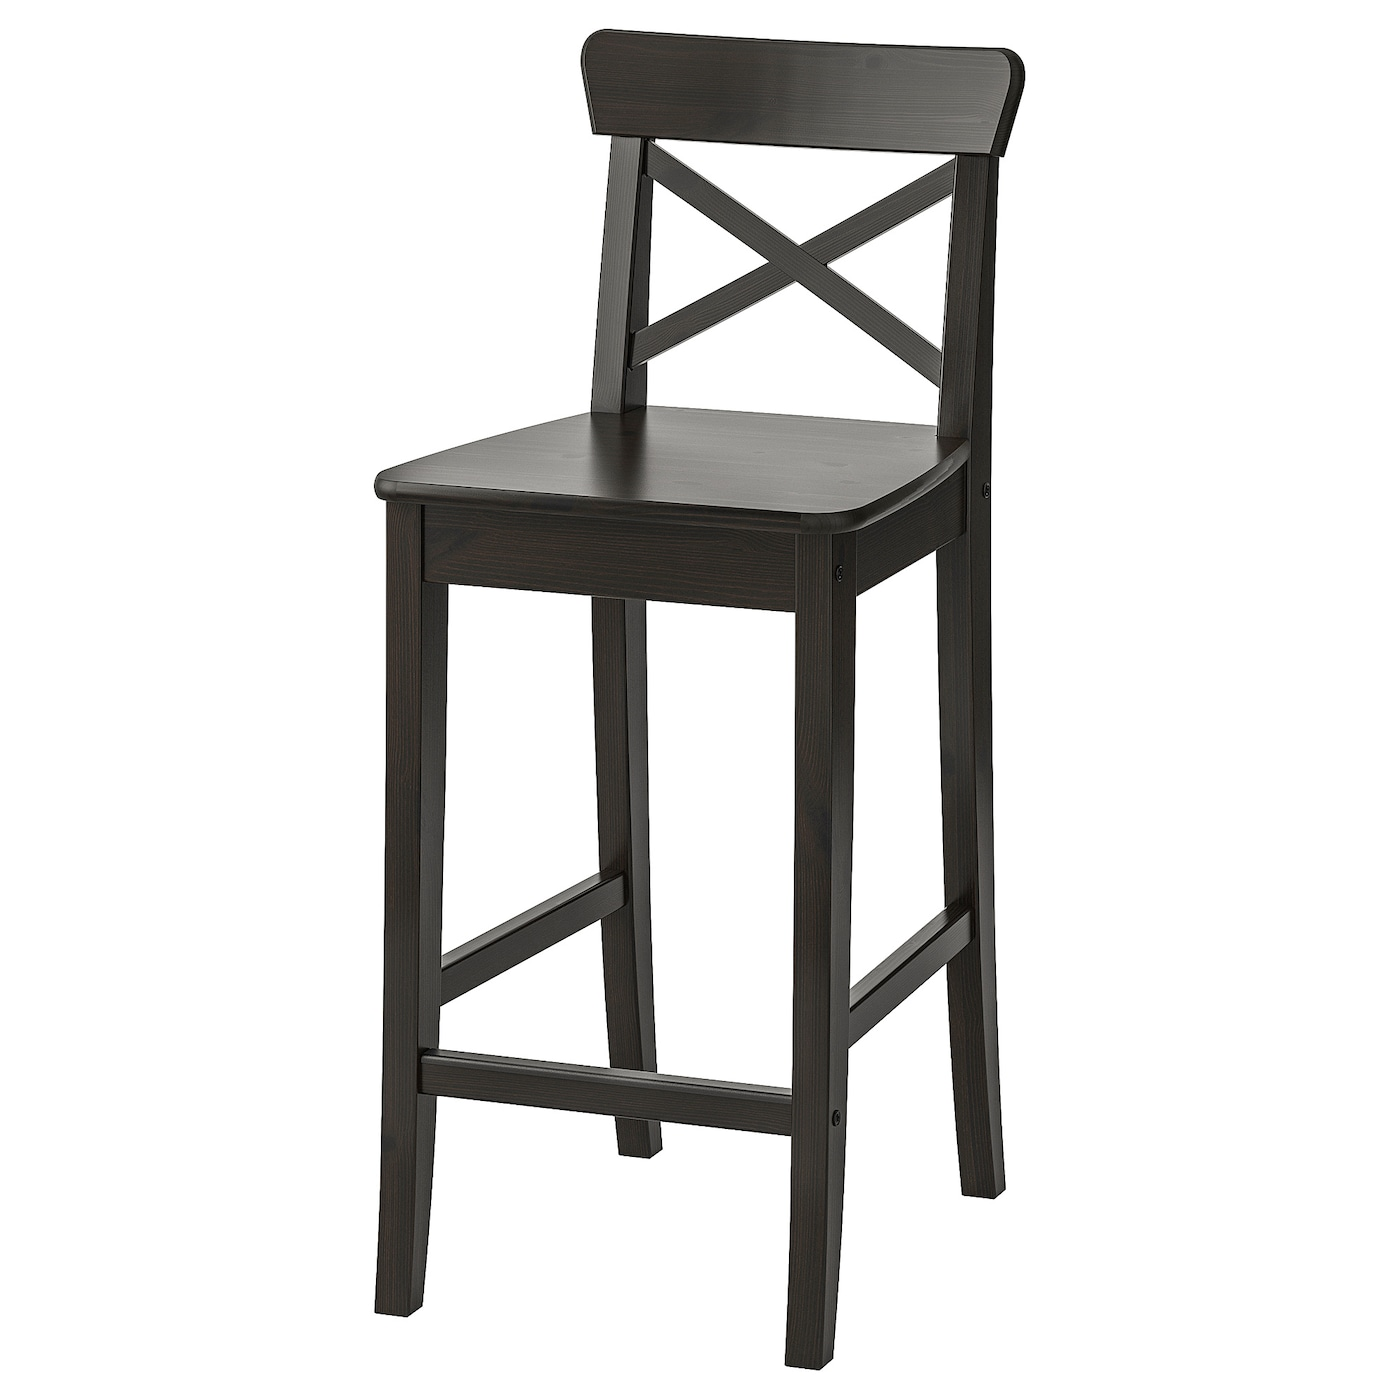 INGOLF Bar stool with backrest   brown black 9 9/9